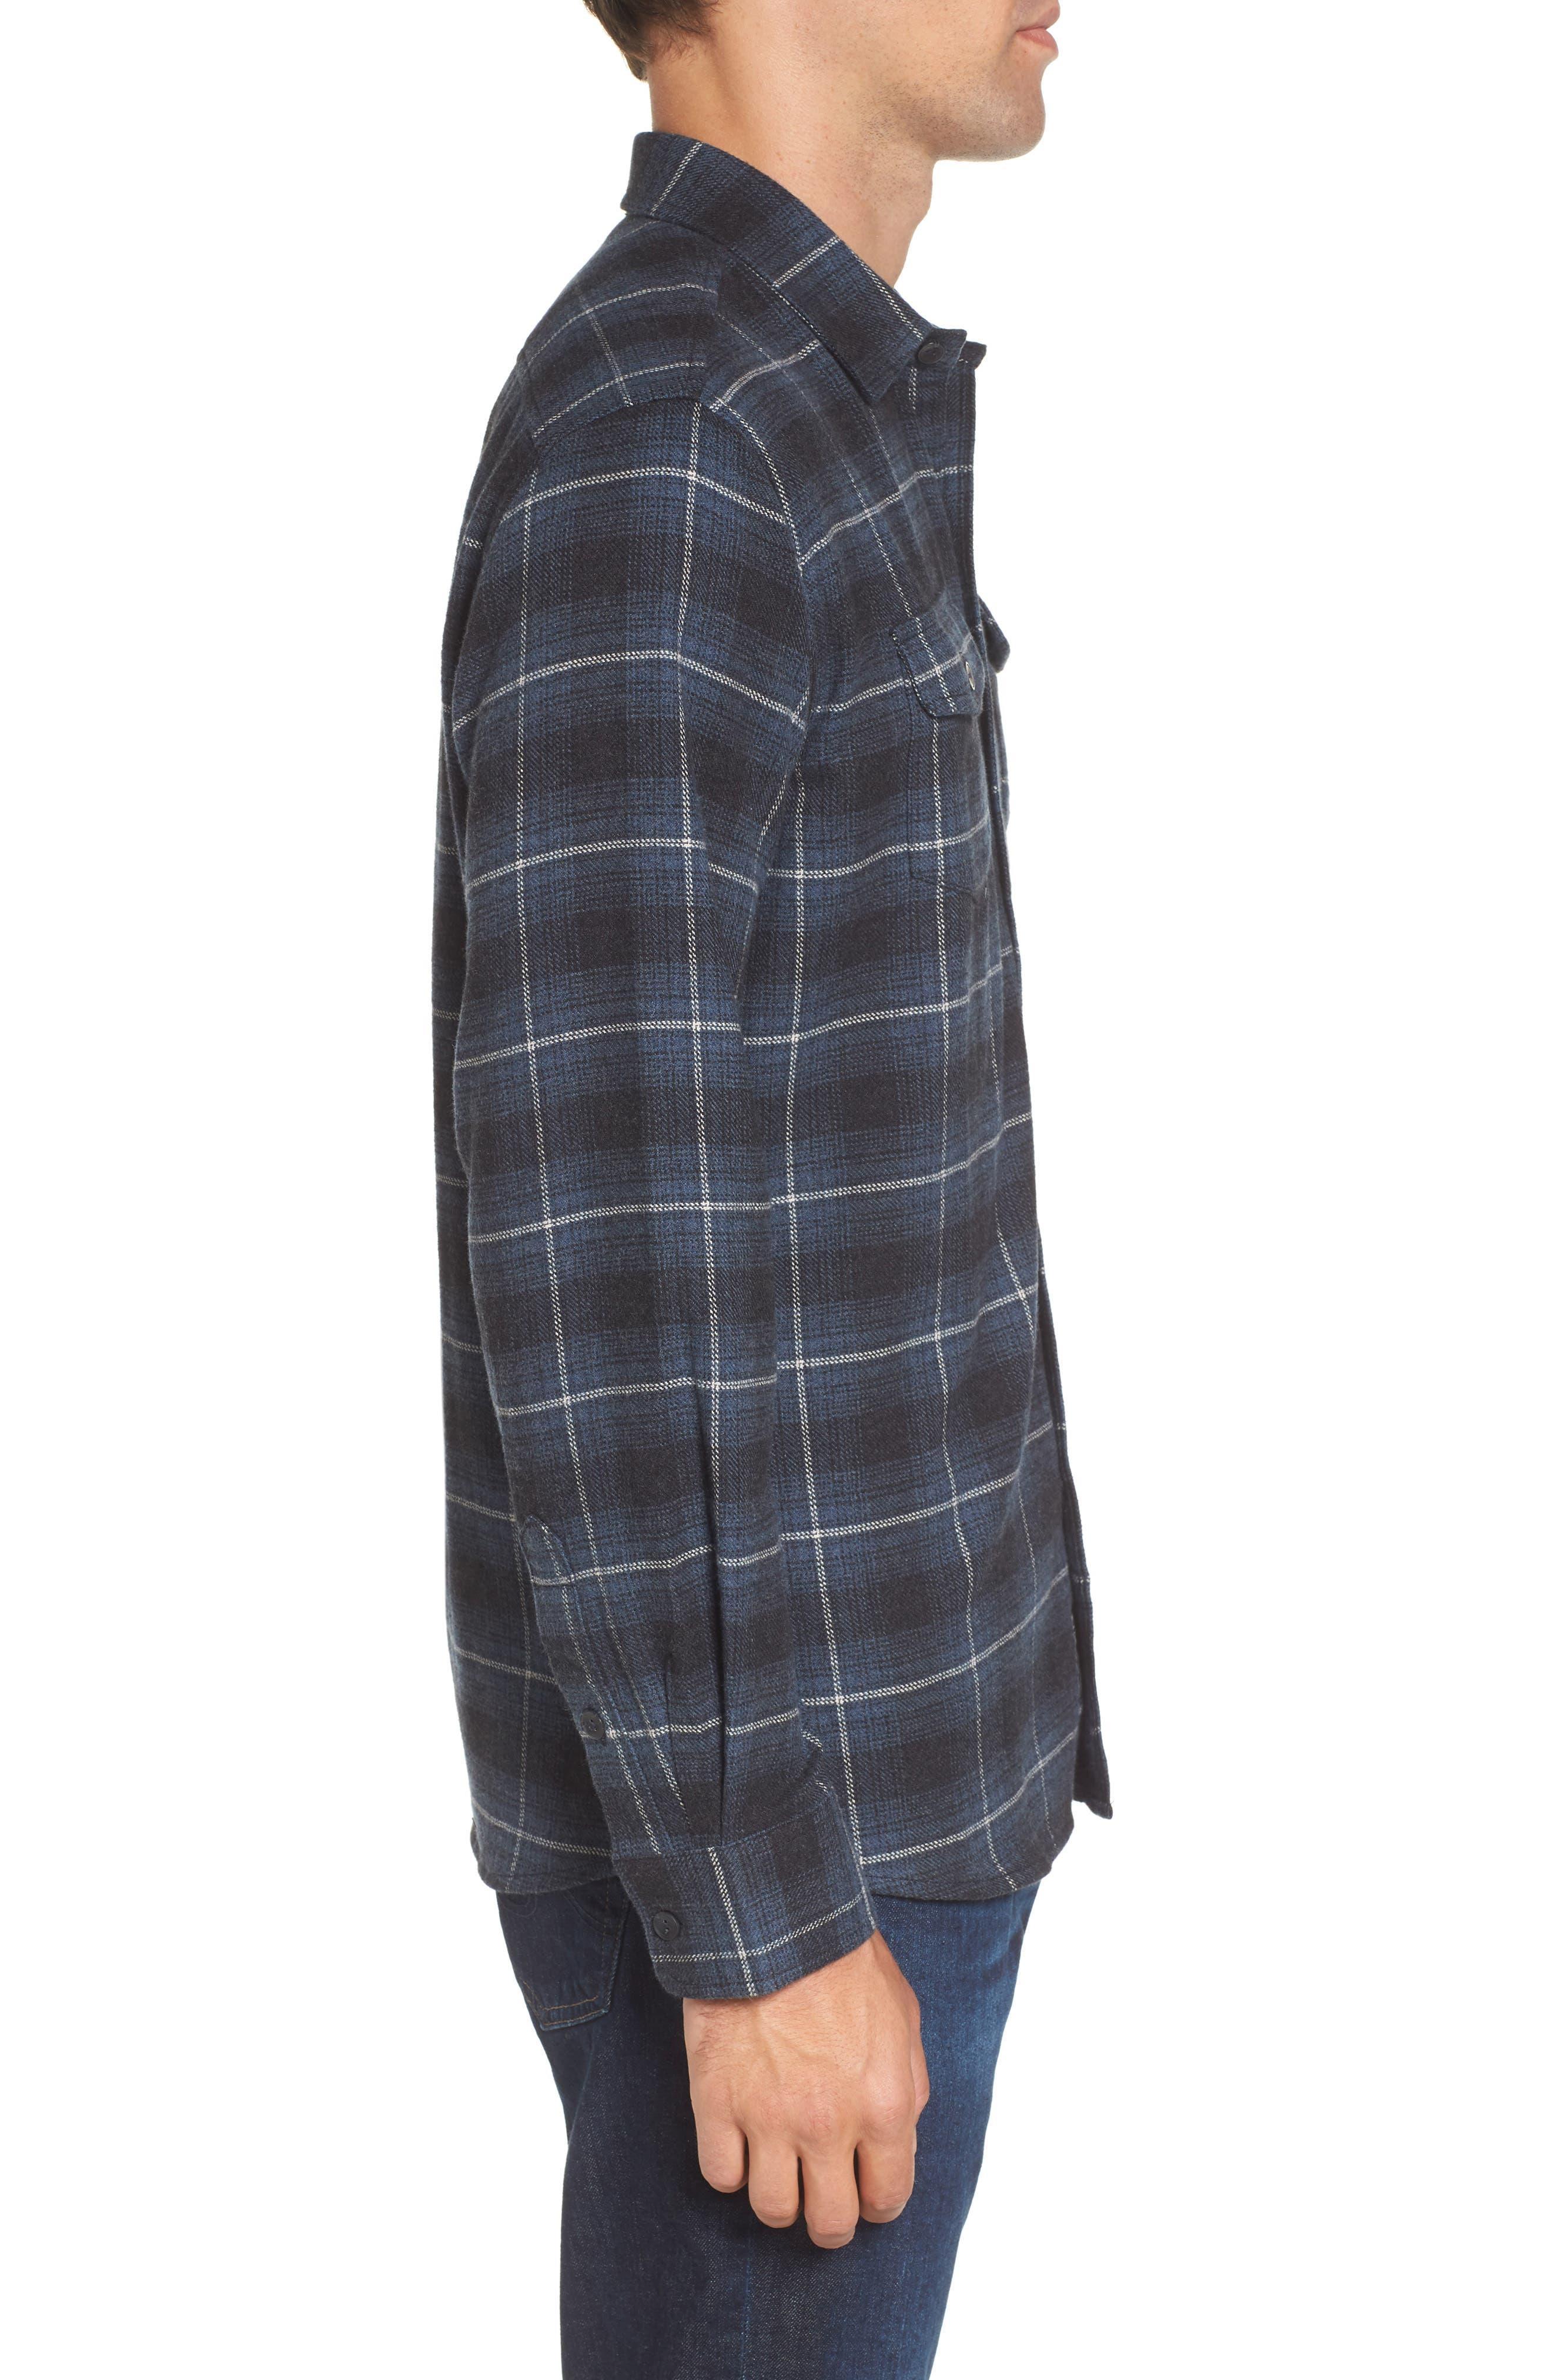 Clarke Heritage Flannel Shirt,                             Alternate thumbnail 3, color,                             Blue Charcoal